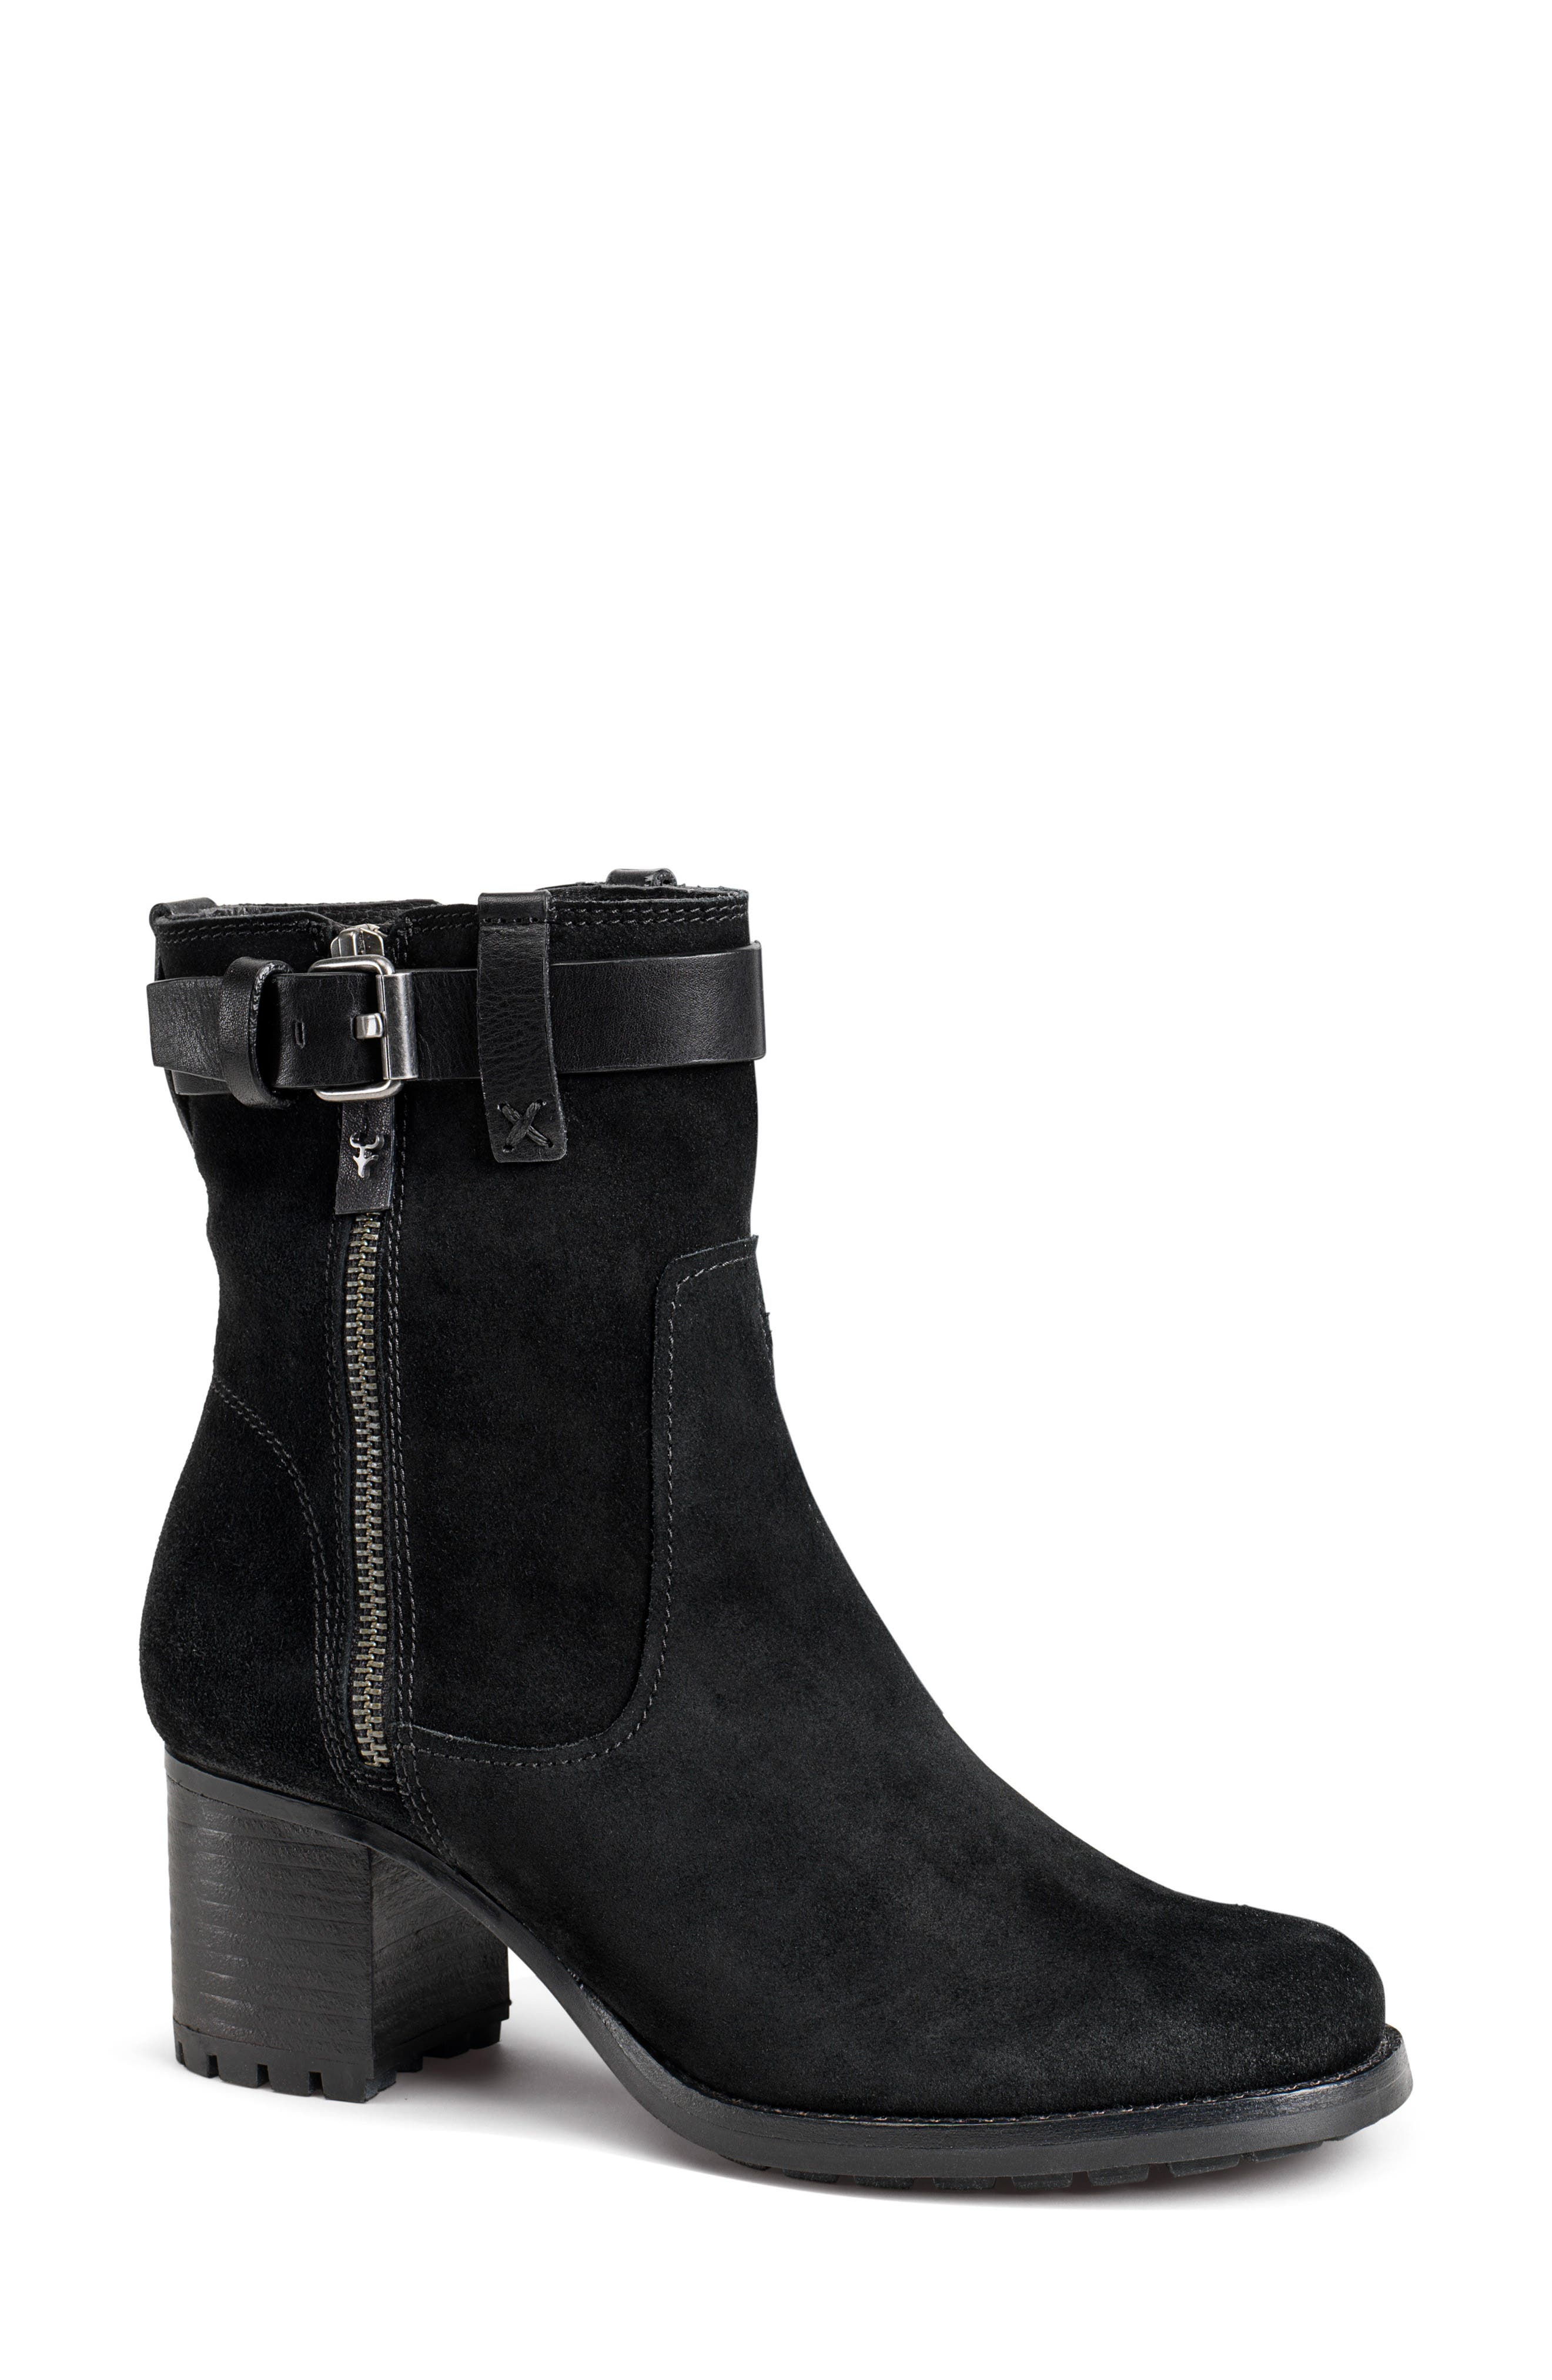 Trask Madison Waterproof Boot- Black